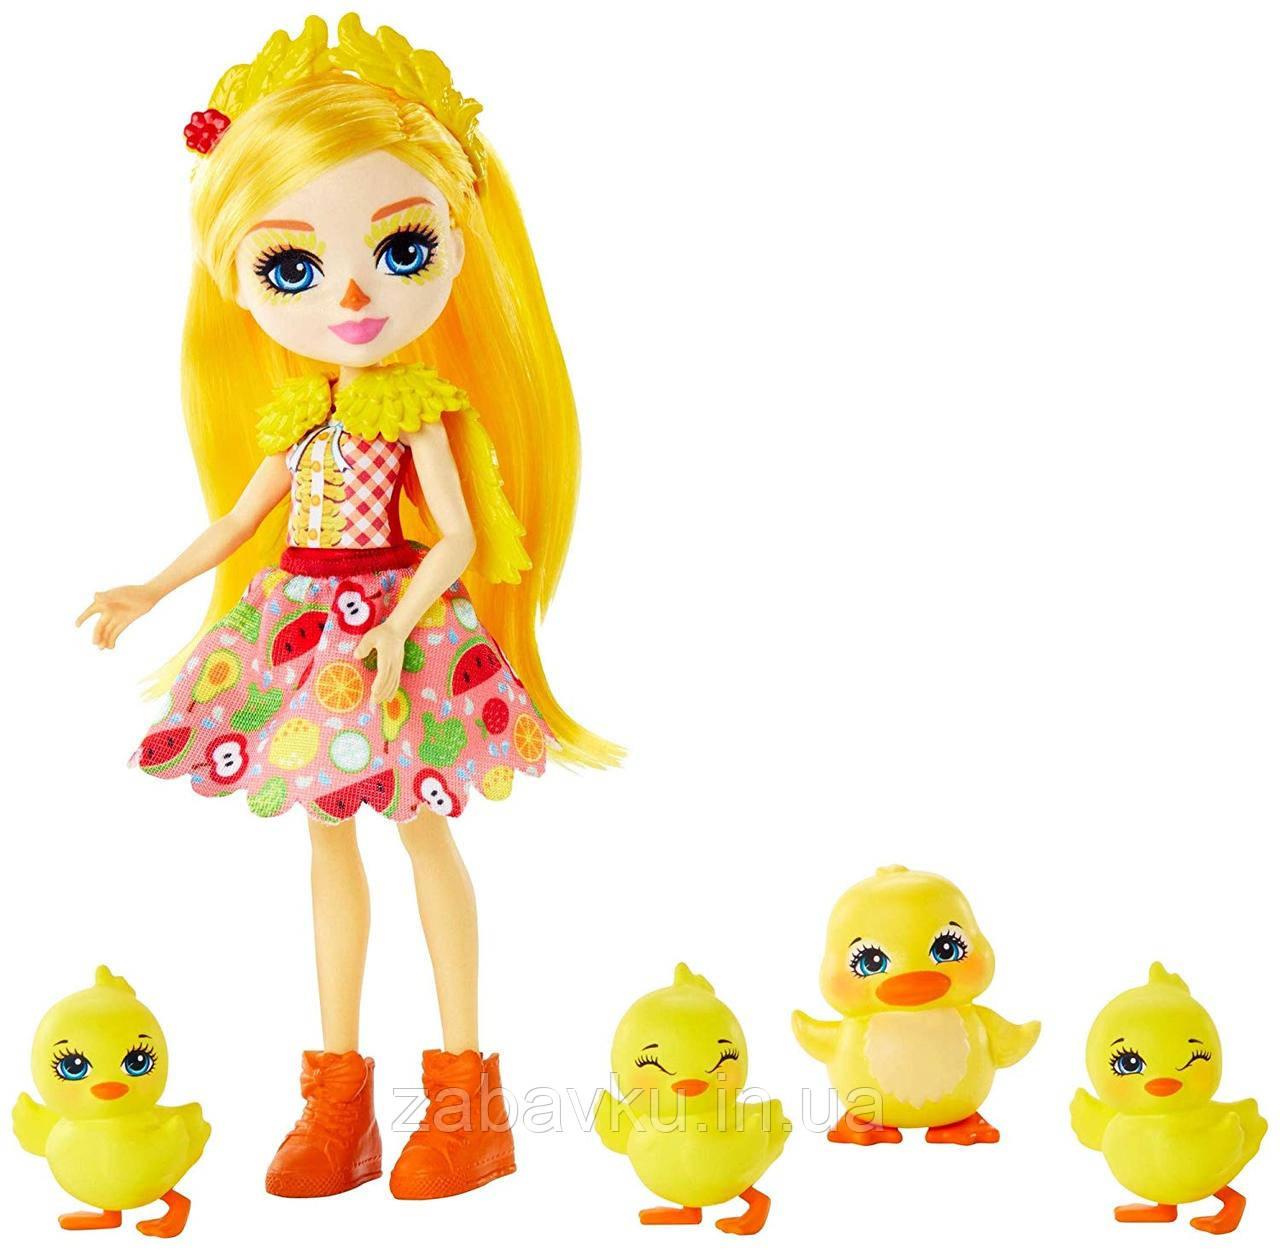 Лялька Енчантімалс Качка Enchantimals Dinah Duck Doll оригінал Кукла энчантималс уточка